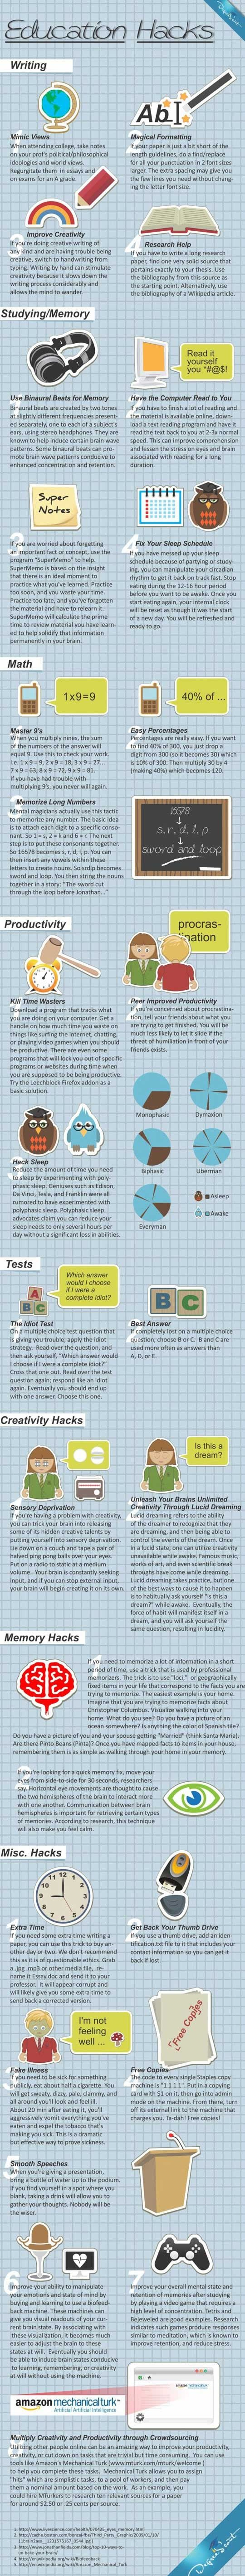 #Senior Brain Health Tip - Great education hacks. Soo helpful. The memory tips are my favorite!